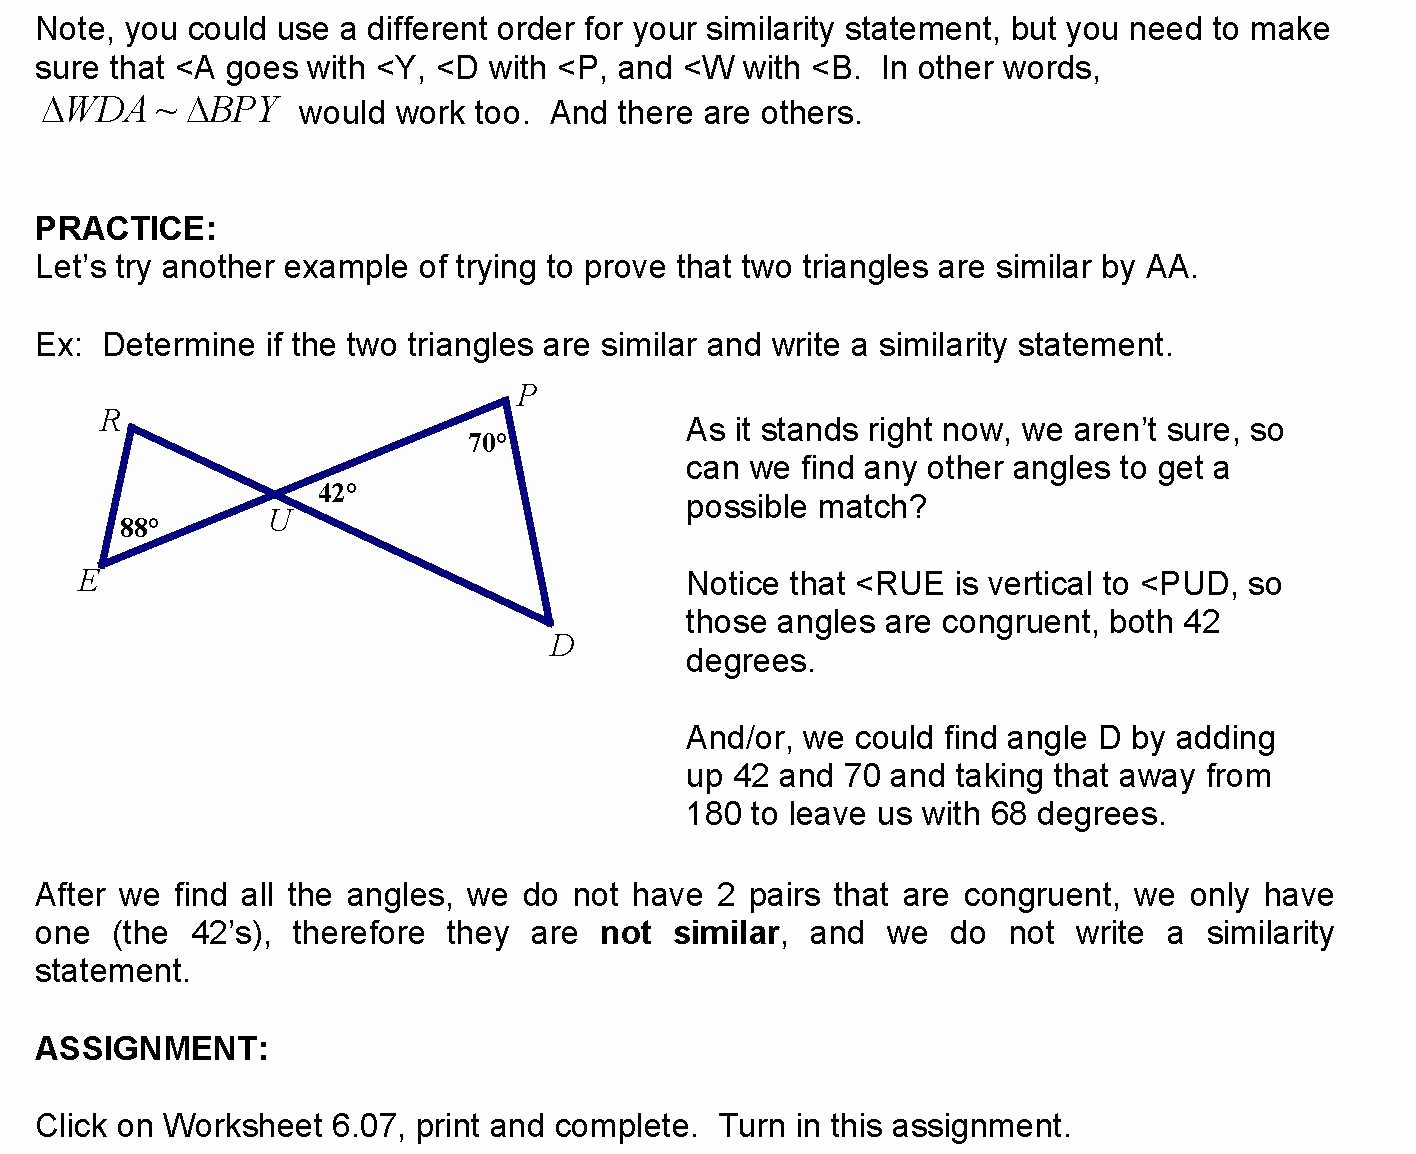 Proving Triangles Similar Worksheet New Cosgeometry Lesson 6 07 Proving Triangles Similar by Aa